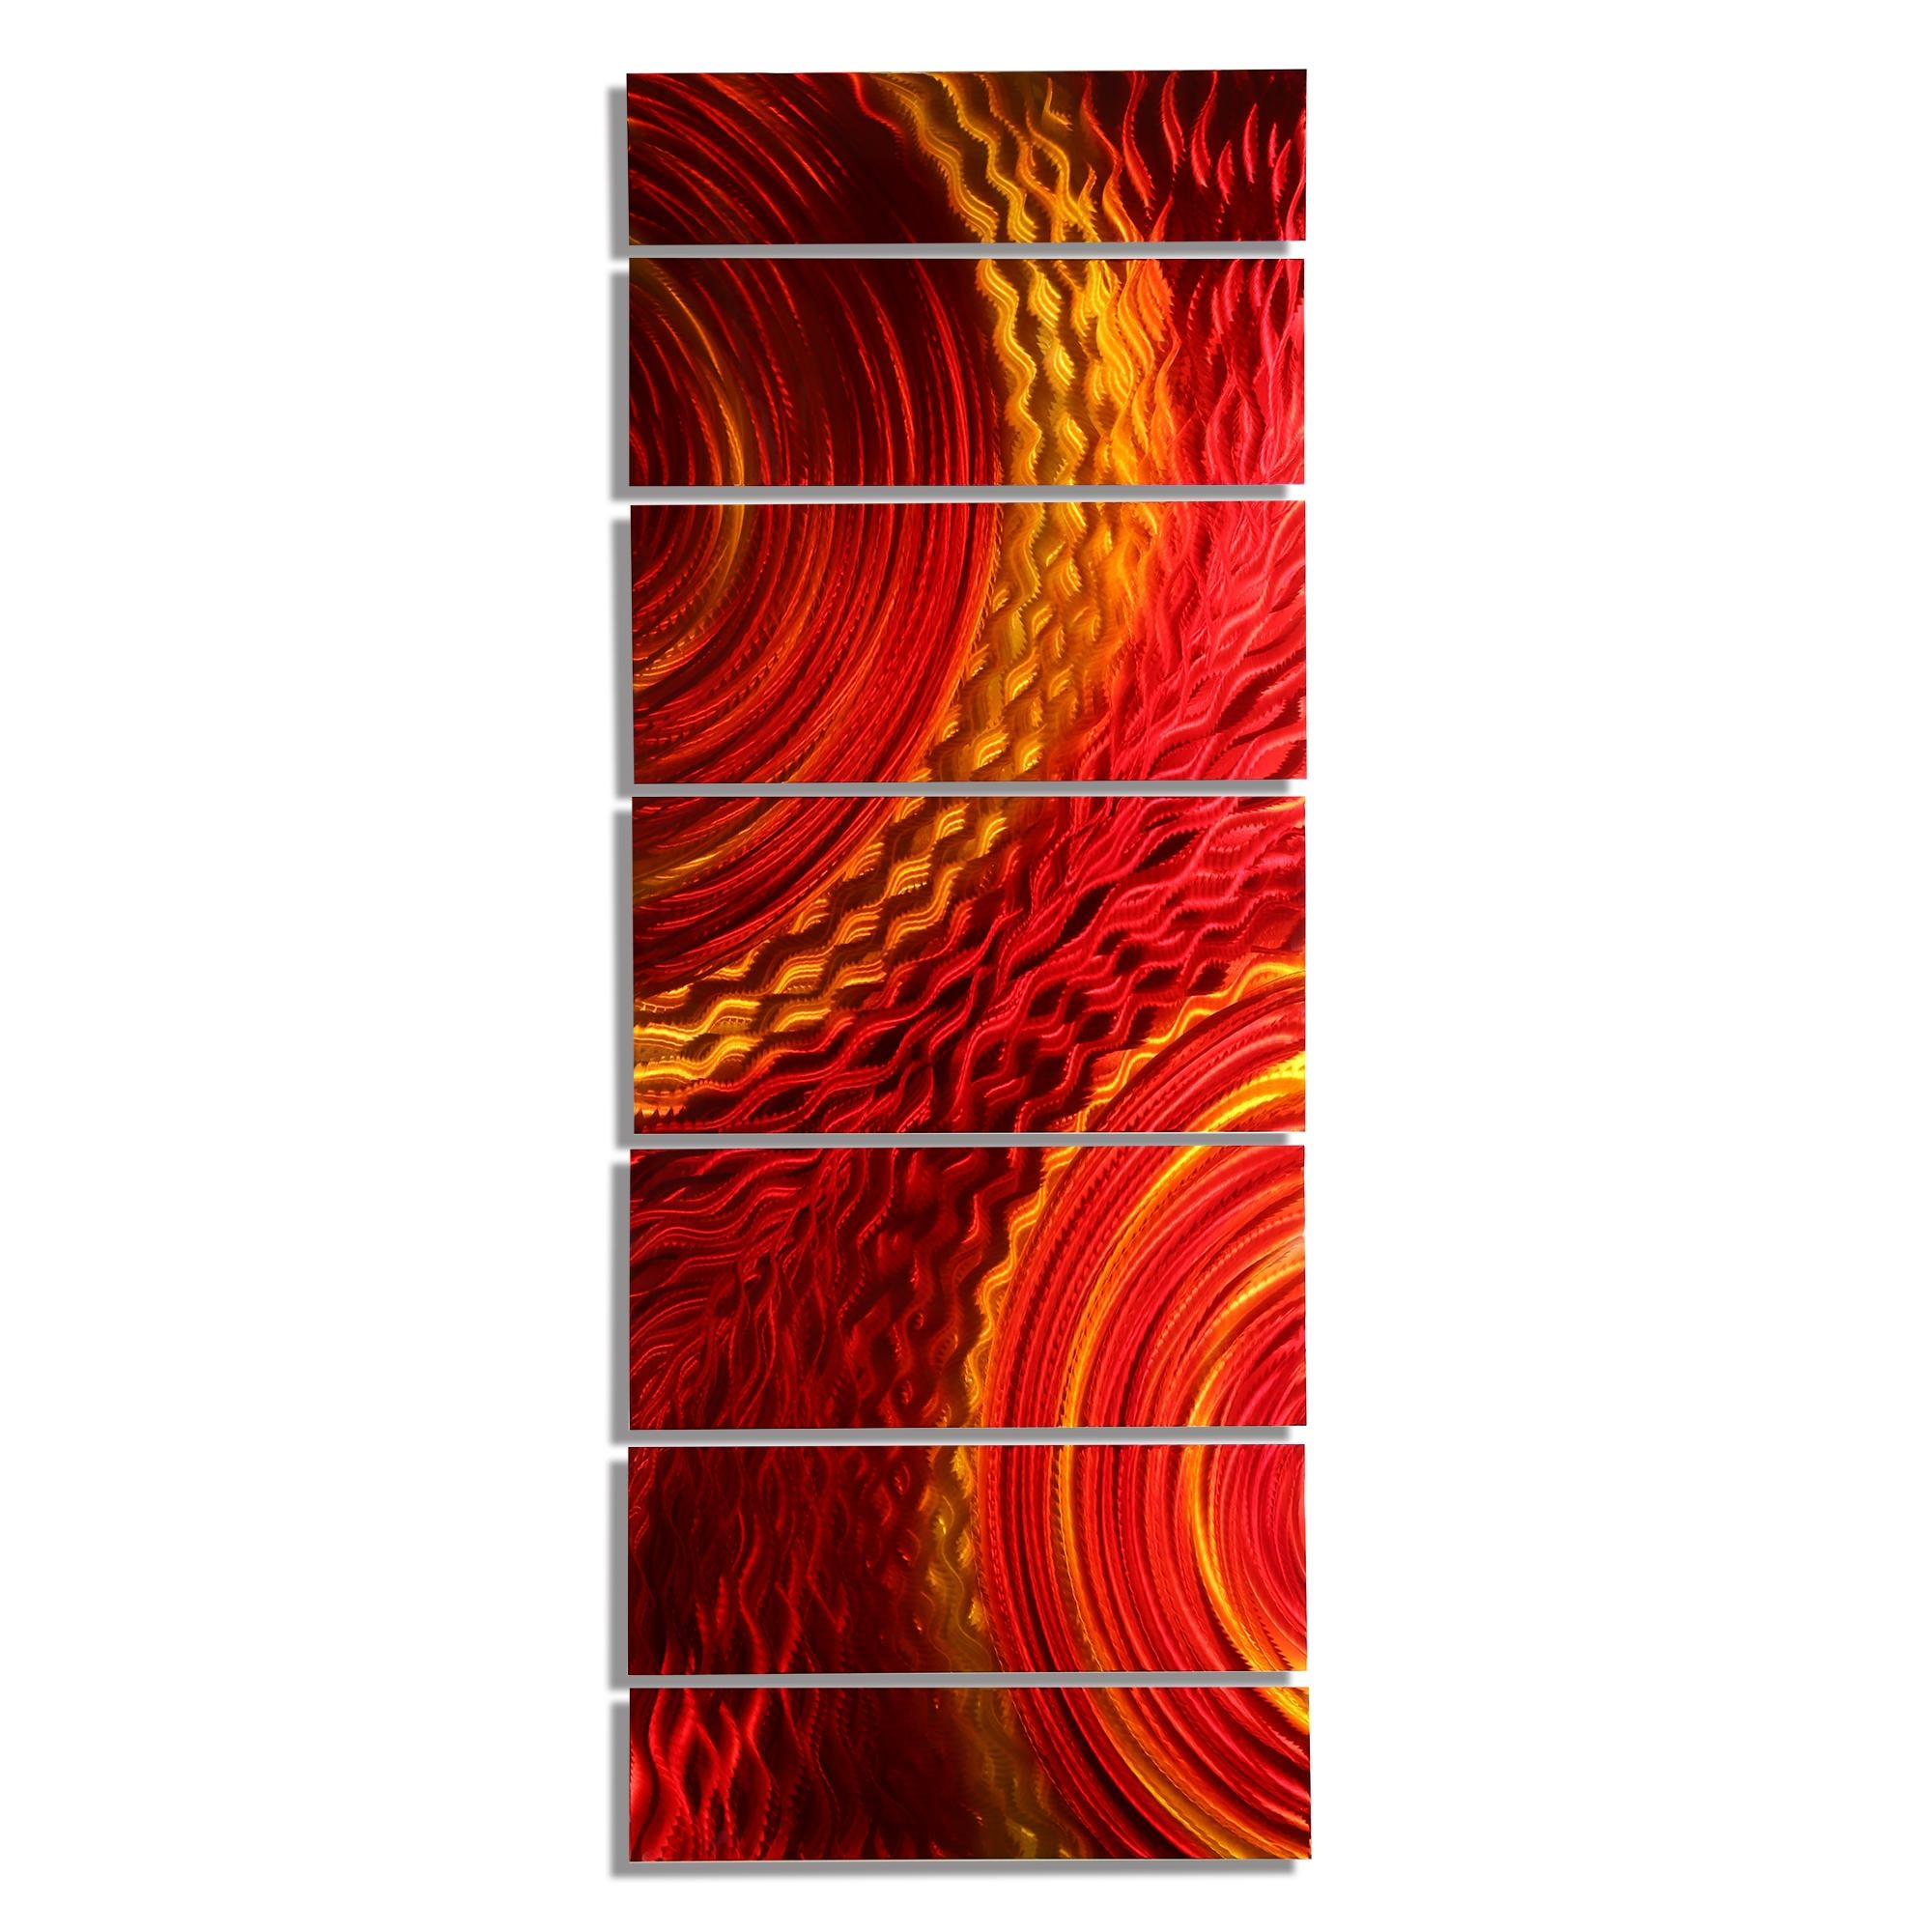 Harvest Moods – Dynamic Red & Gold Modern Metal Wall Sculpture Inside Rectangular Metal Wall Art (View 16 of 20)